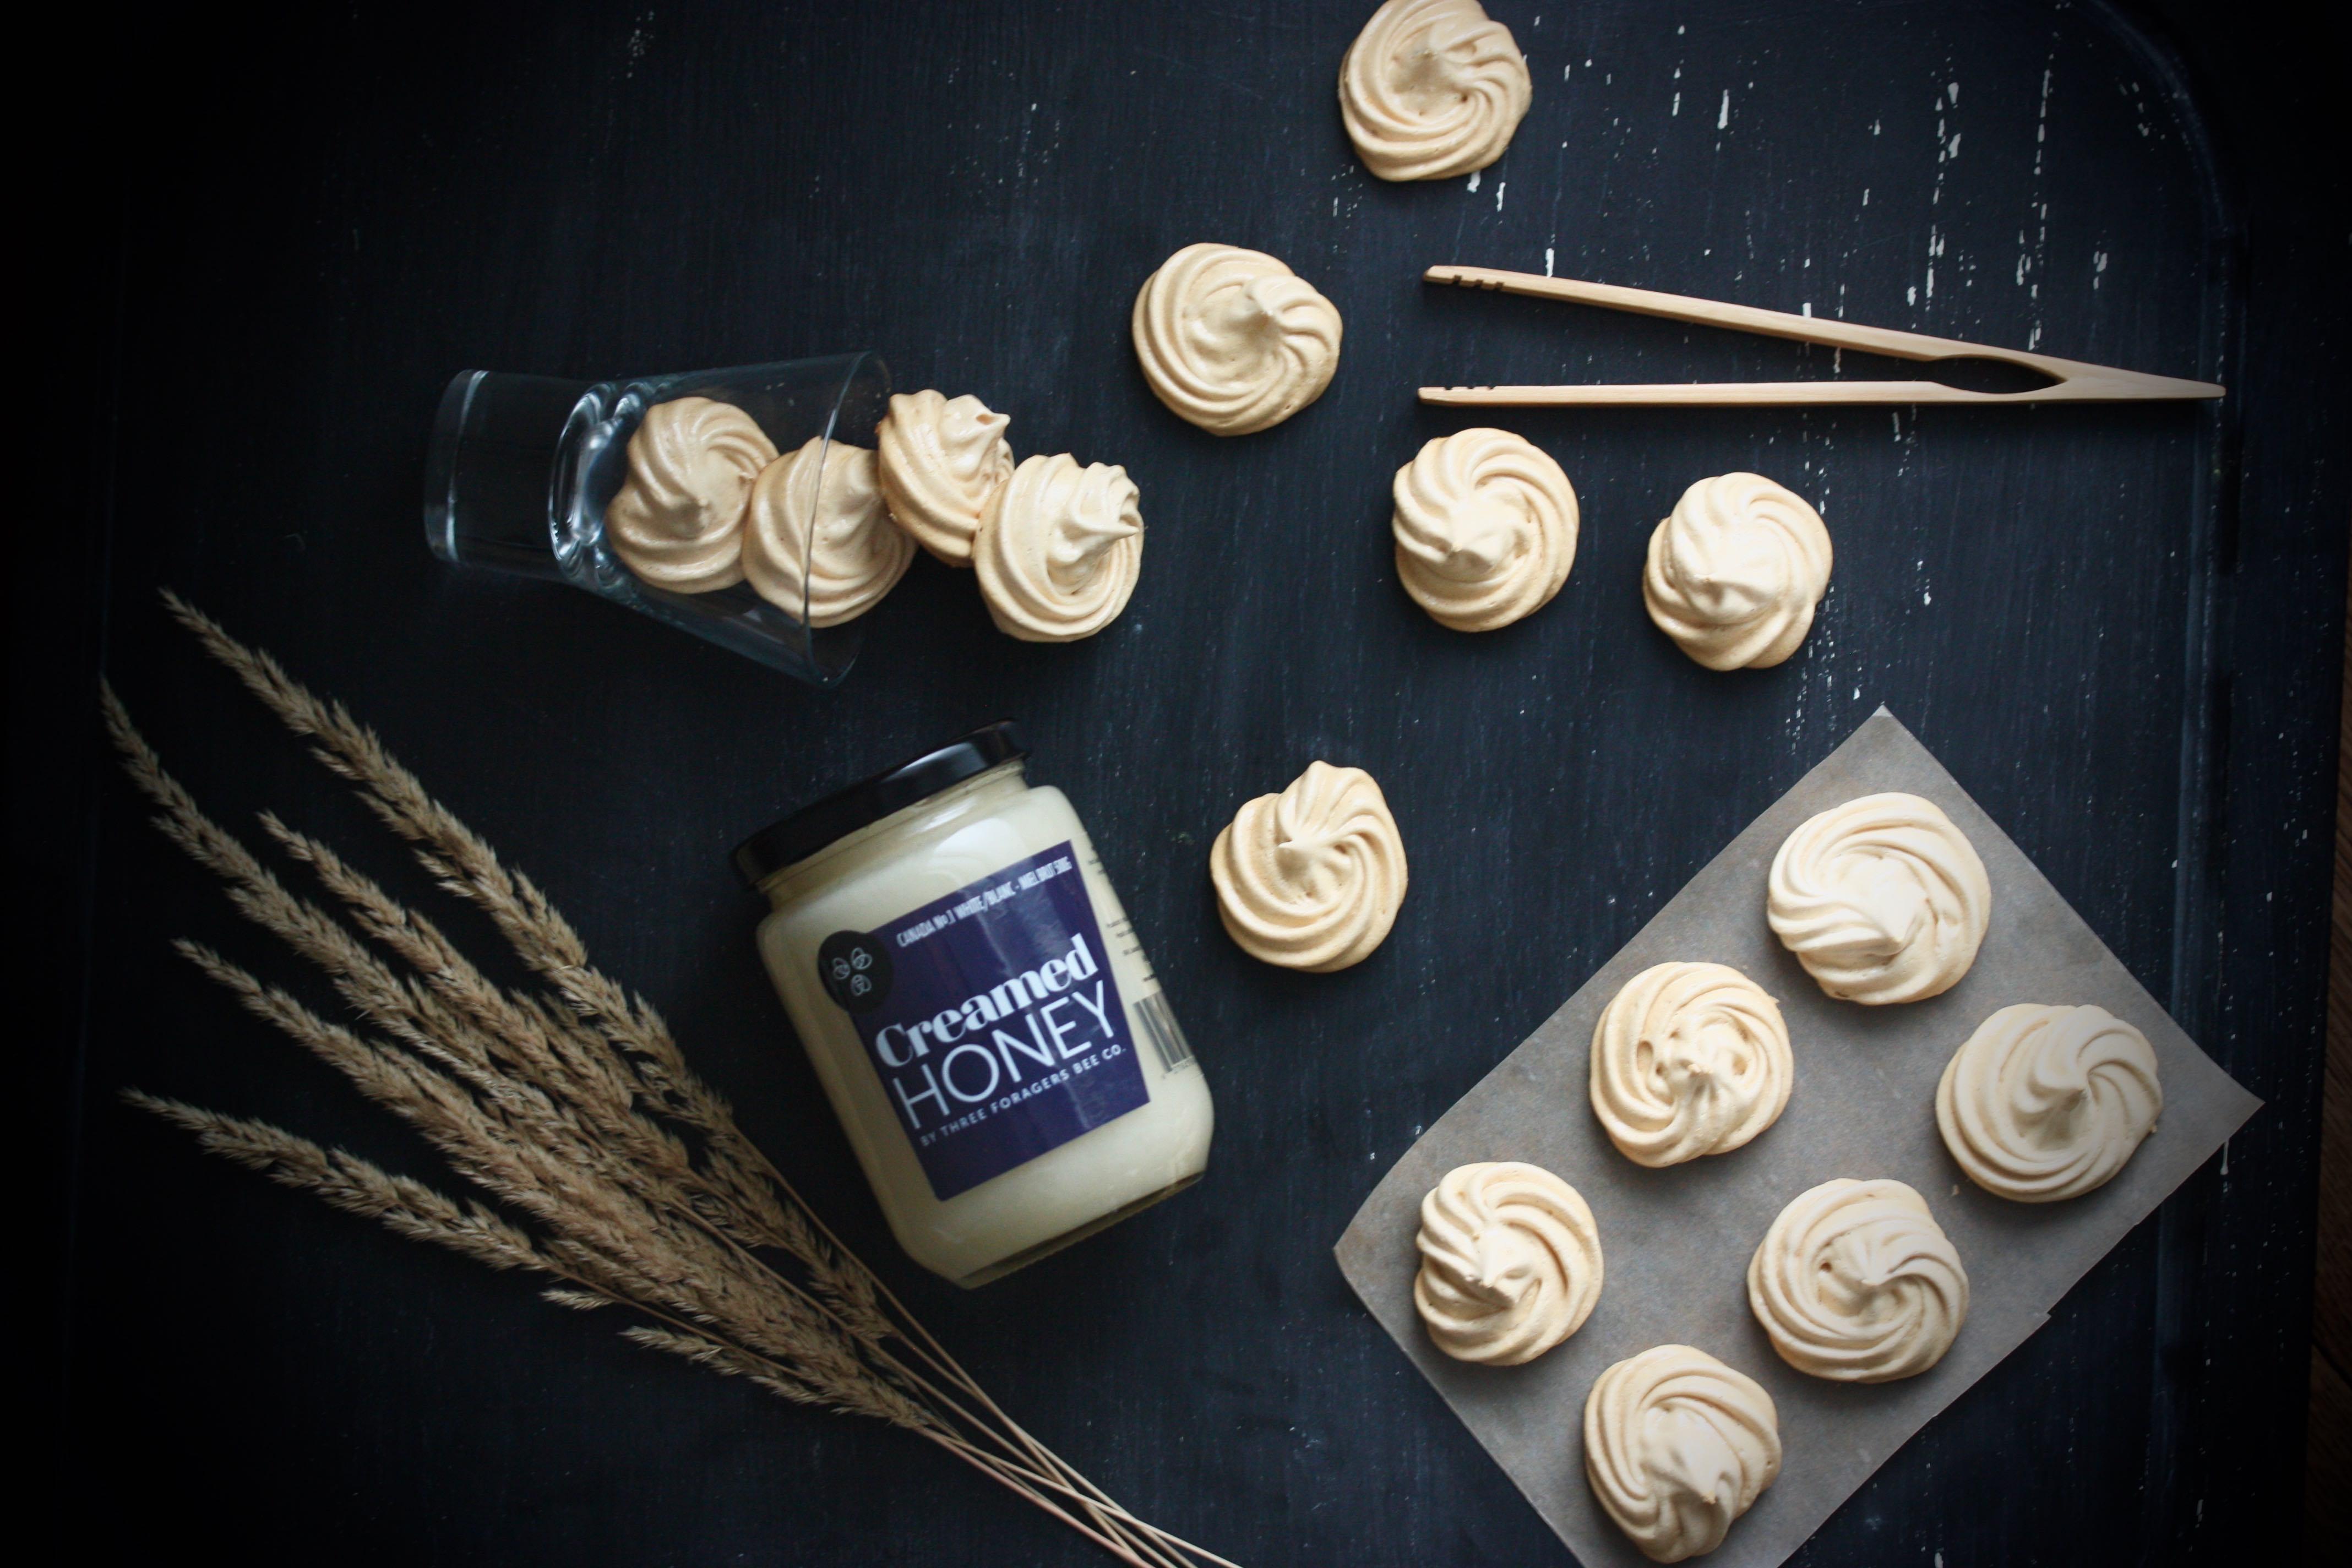 Honey meringues